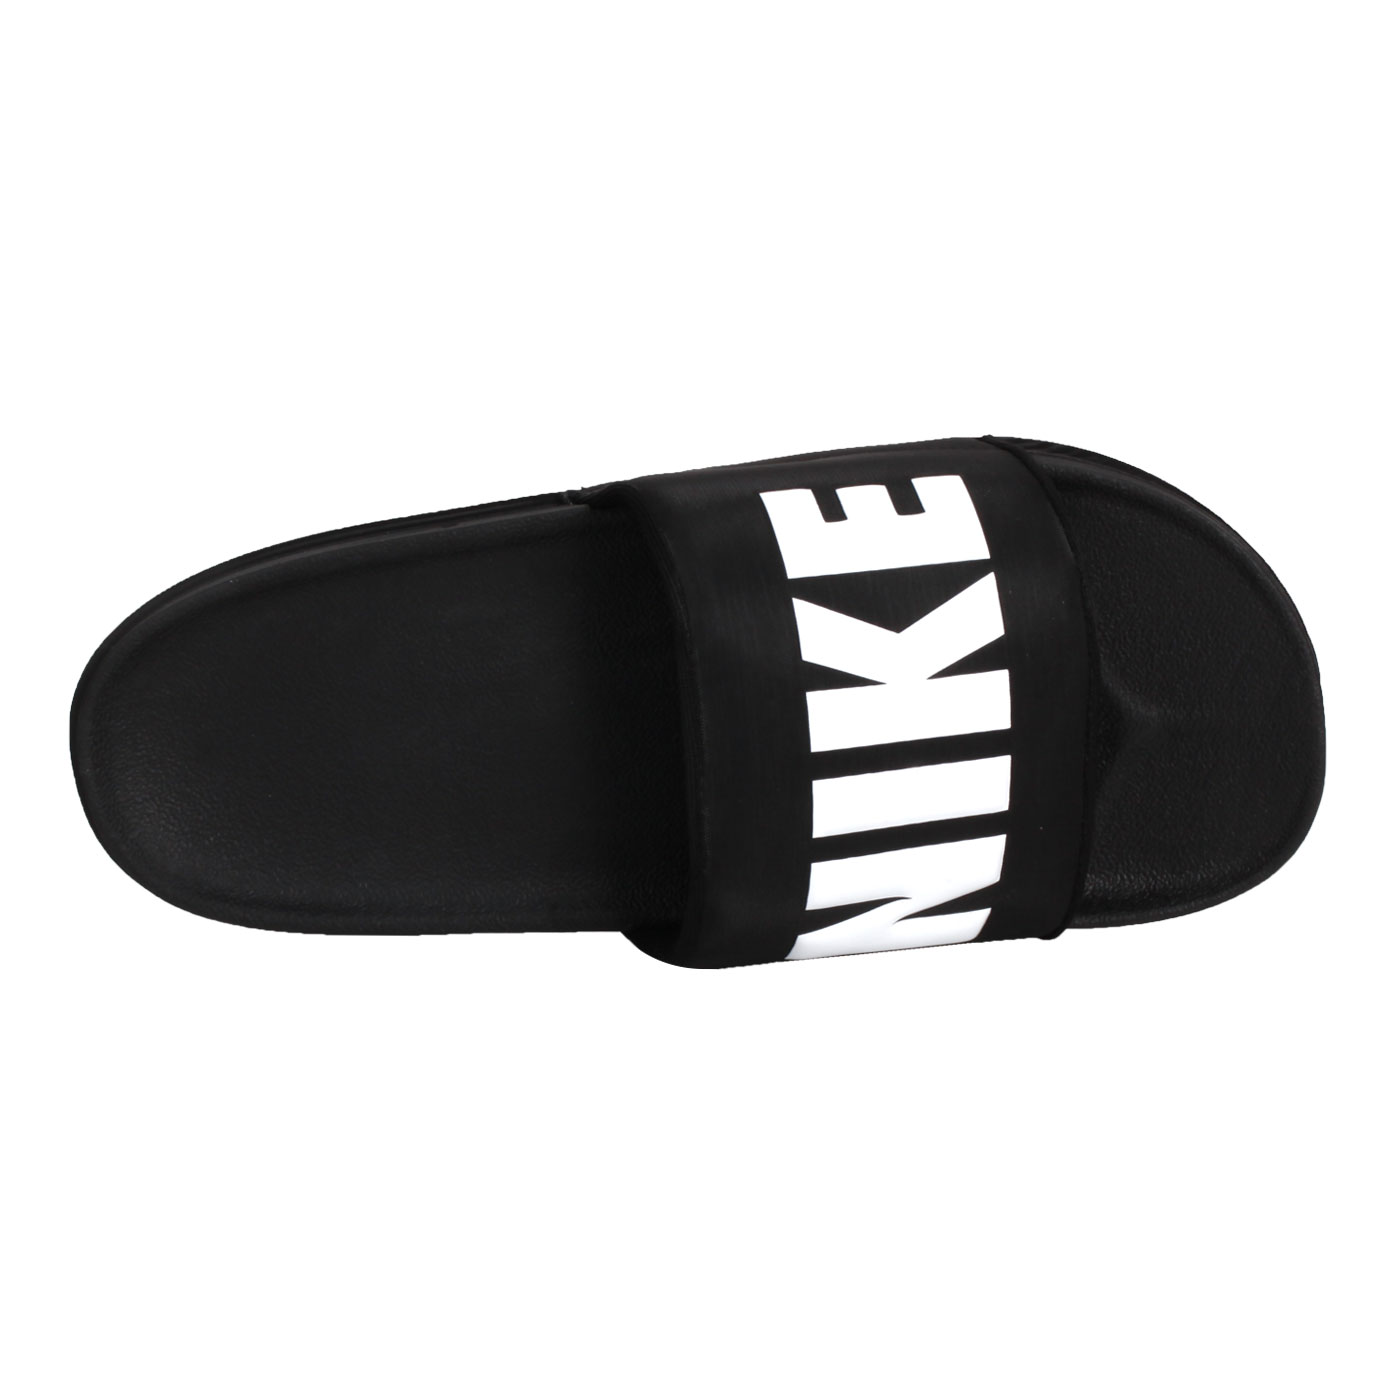 NIKE 男款運動拖鞋  @OFFCOURT SLIDE@BQ4639012 - 黑白